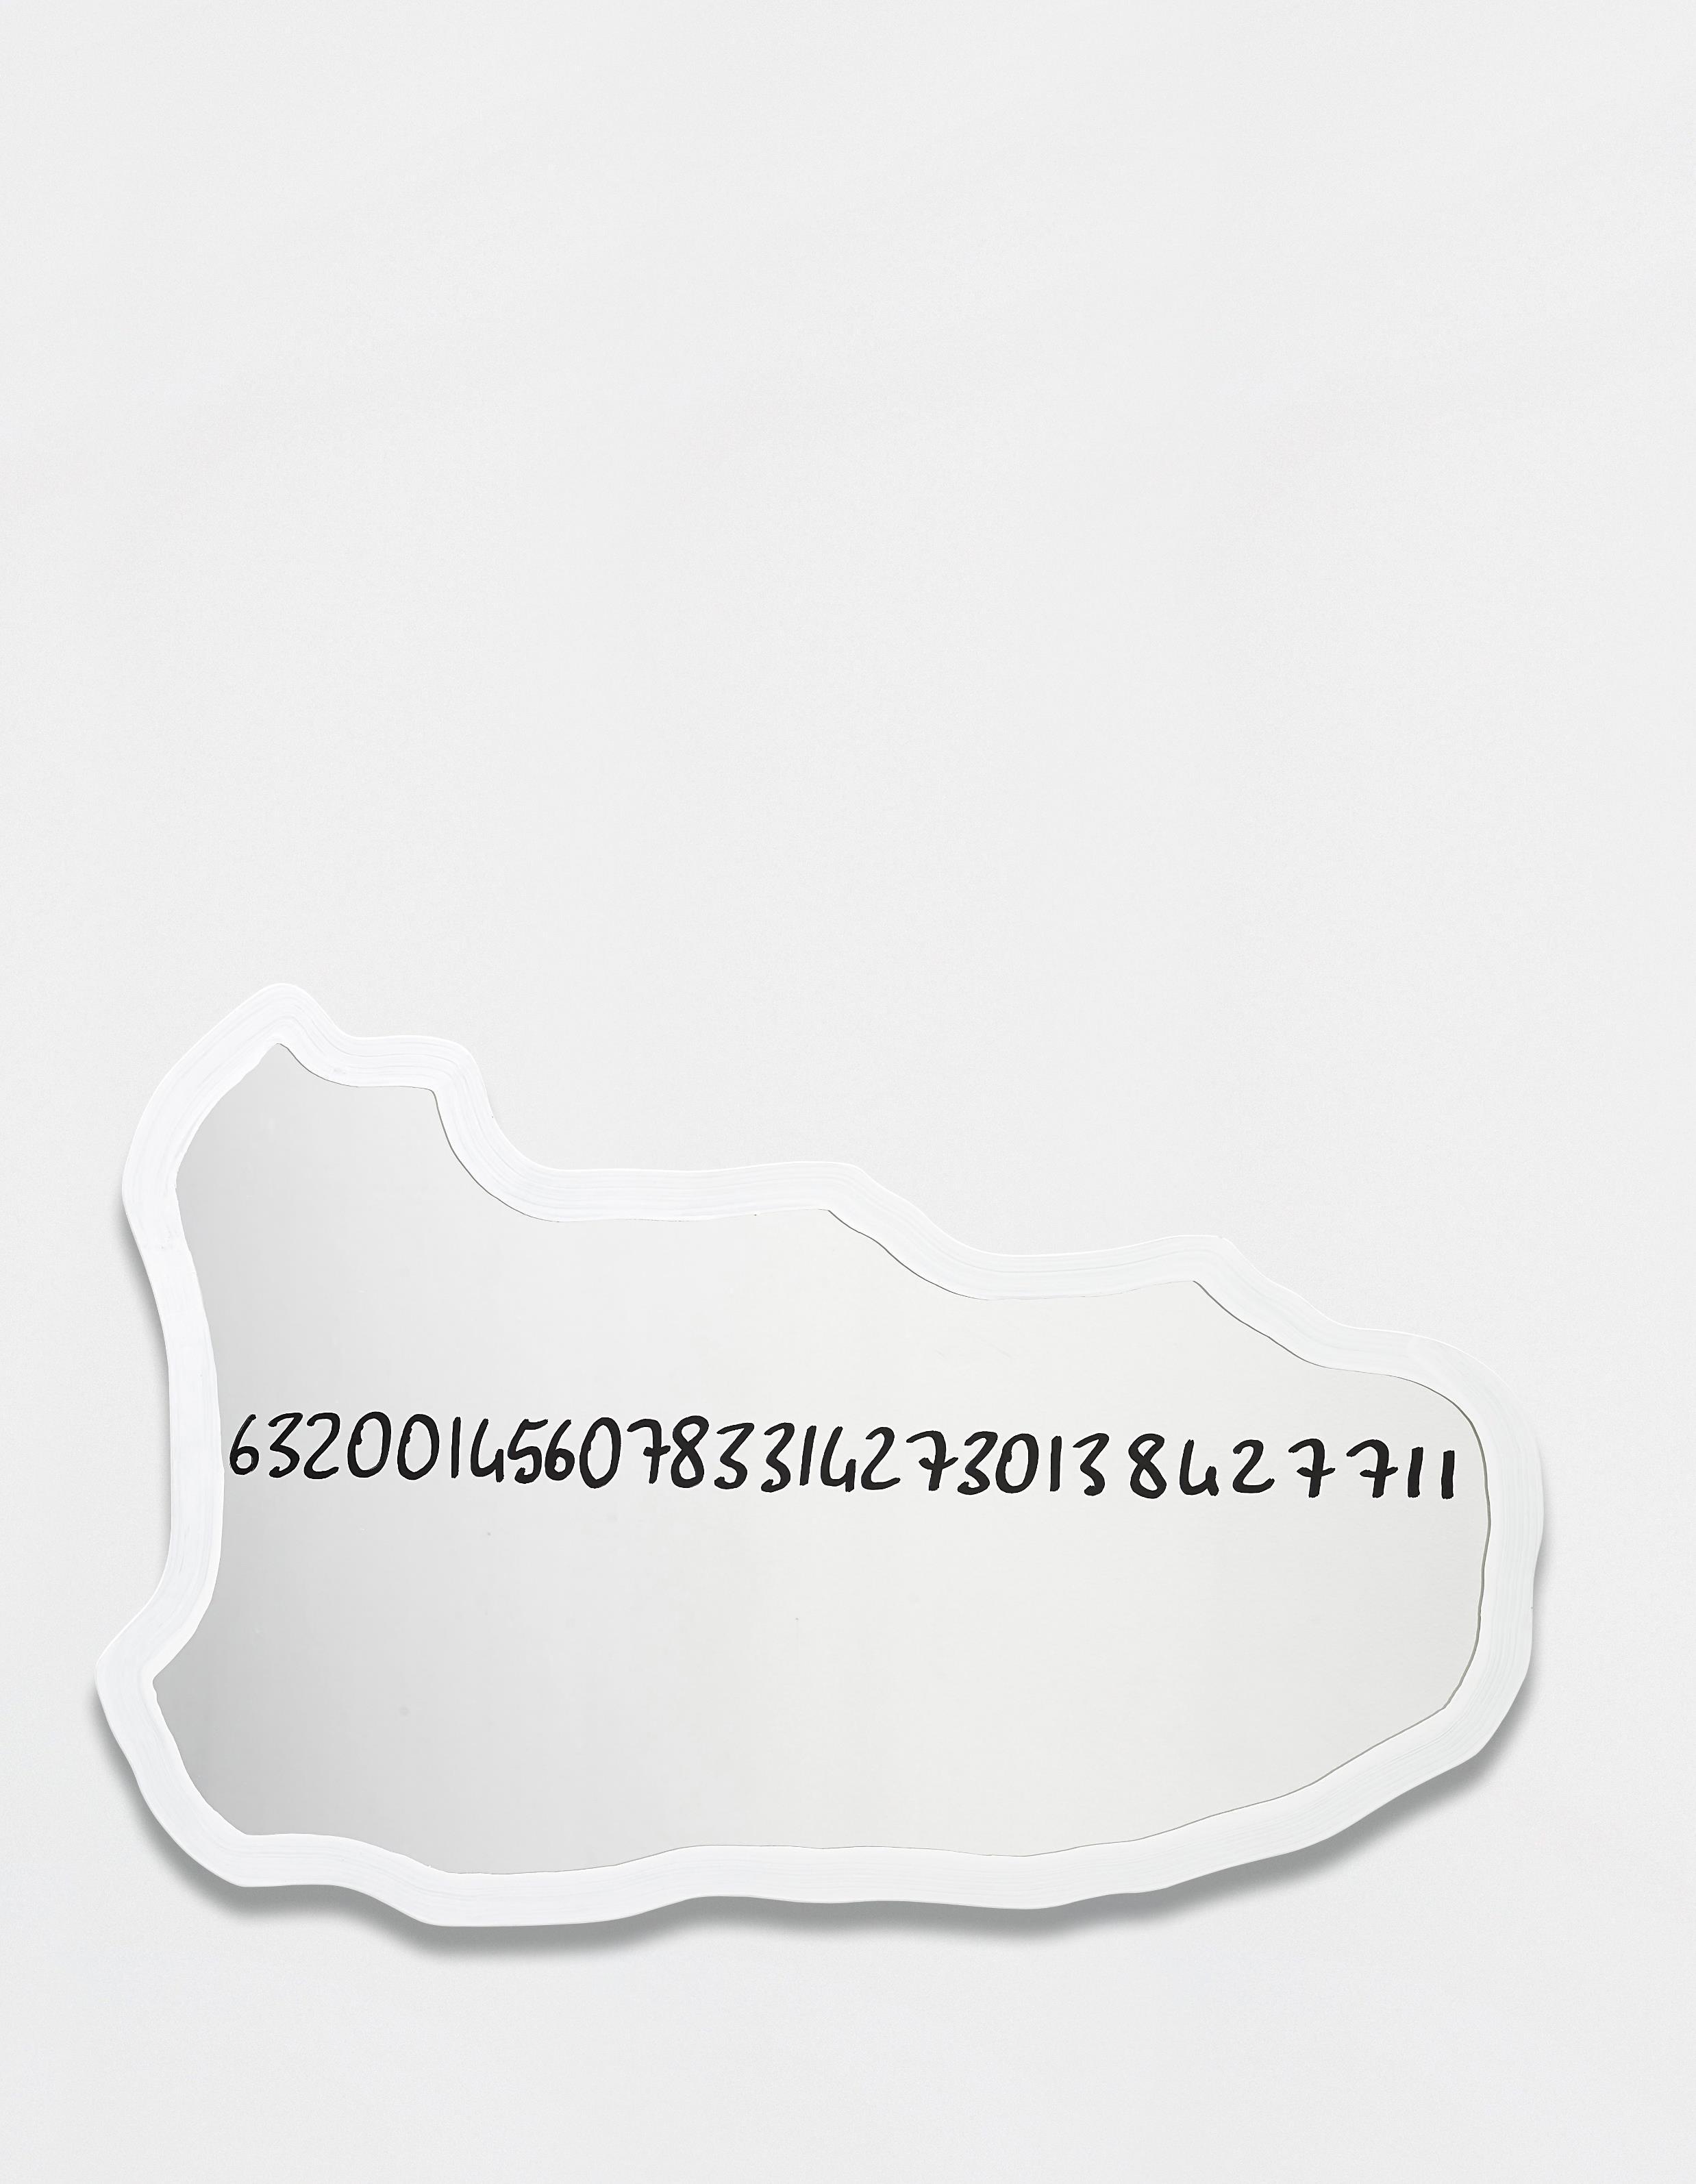 Michelangelo Pistoletto-Frattali (White)-2000